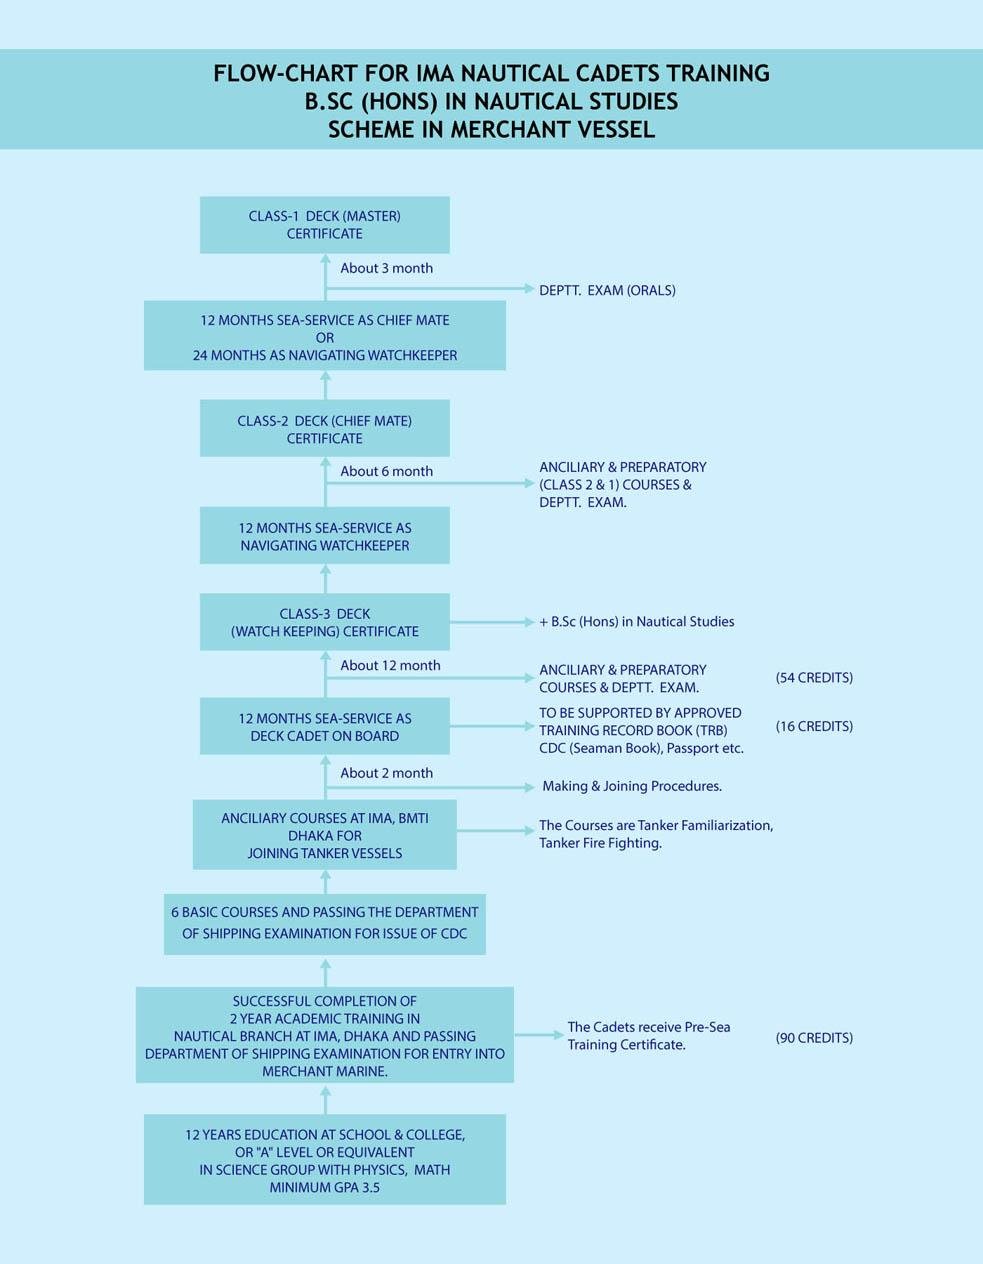 Career international maritime academy flow chart of career path for ima nautical cadets nvjuhfo Gallery